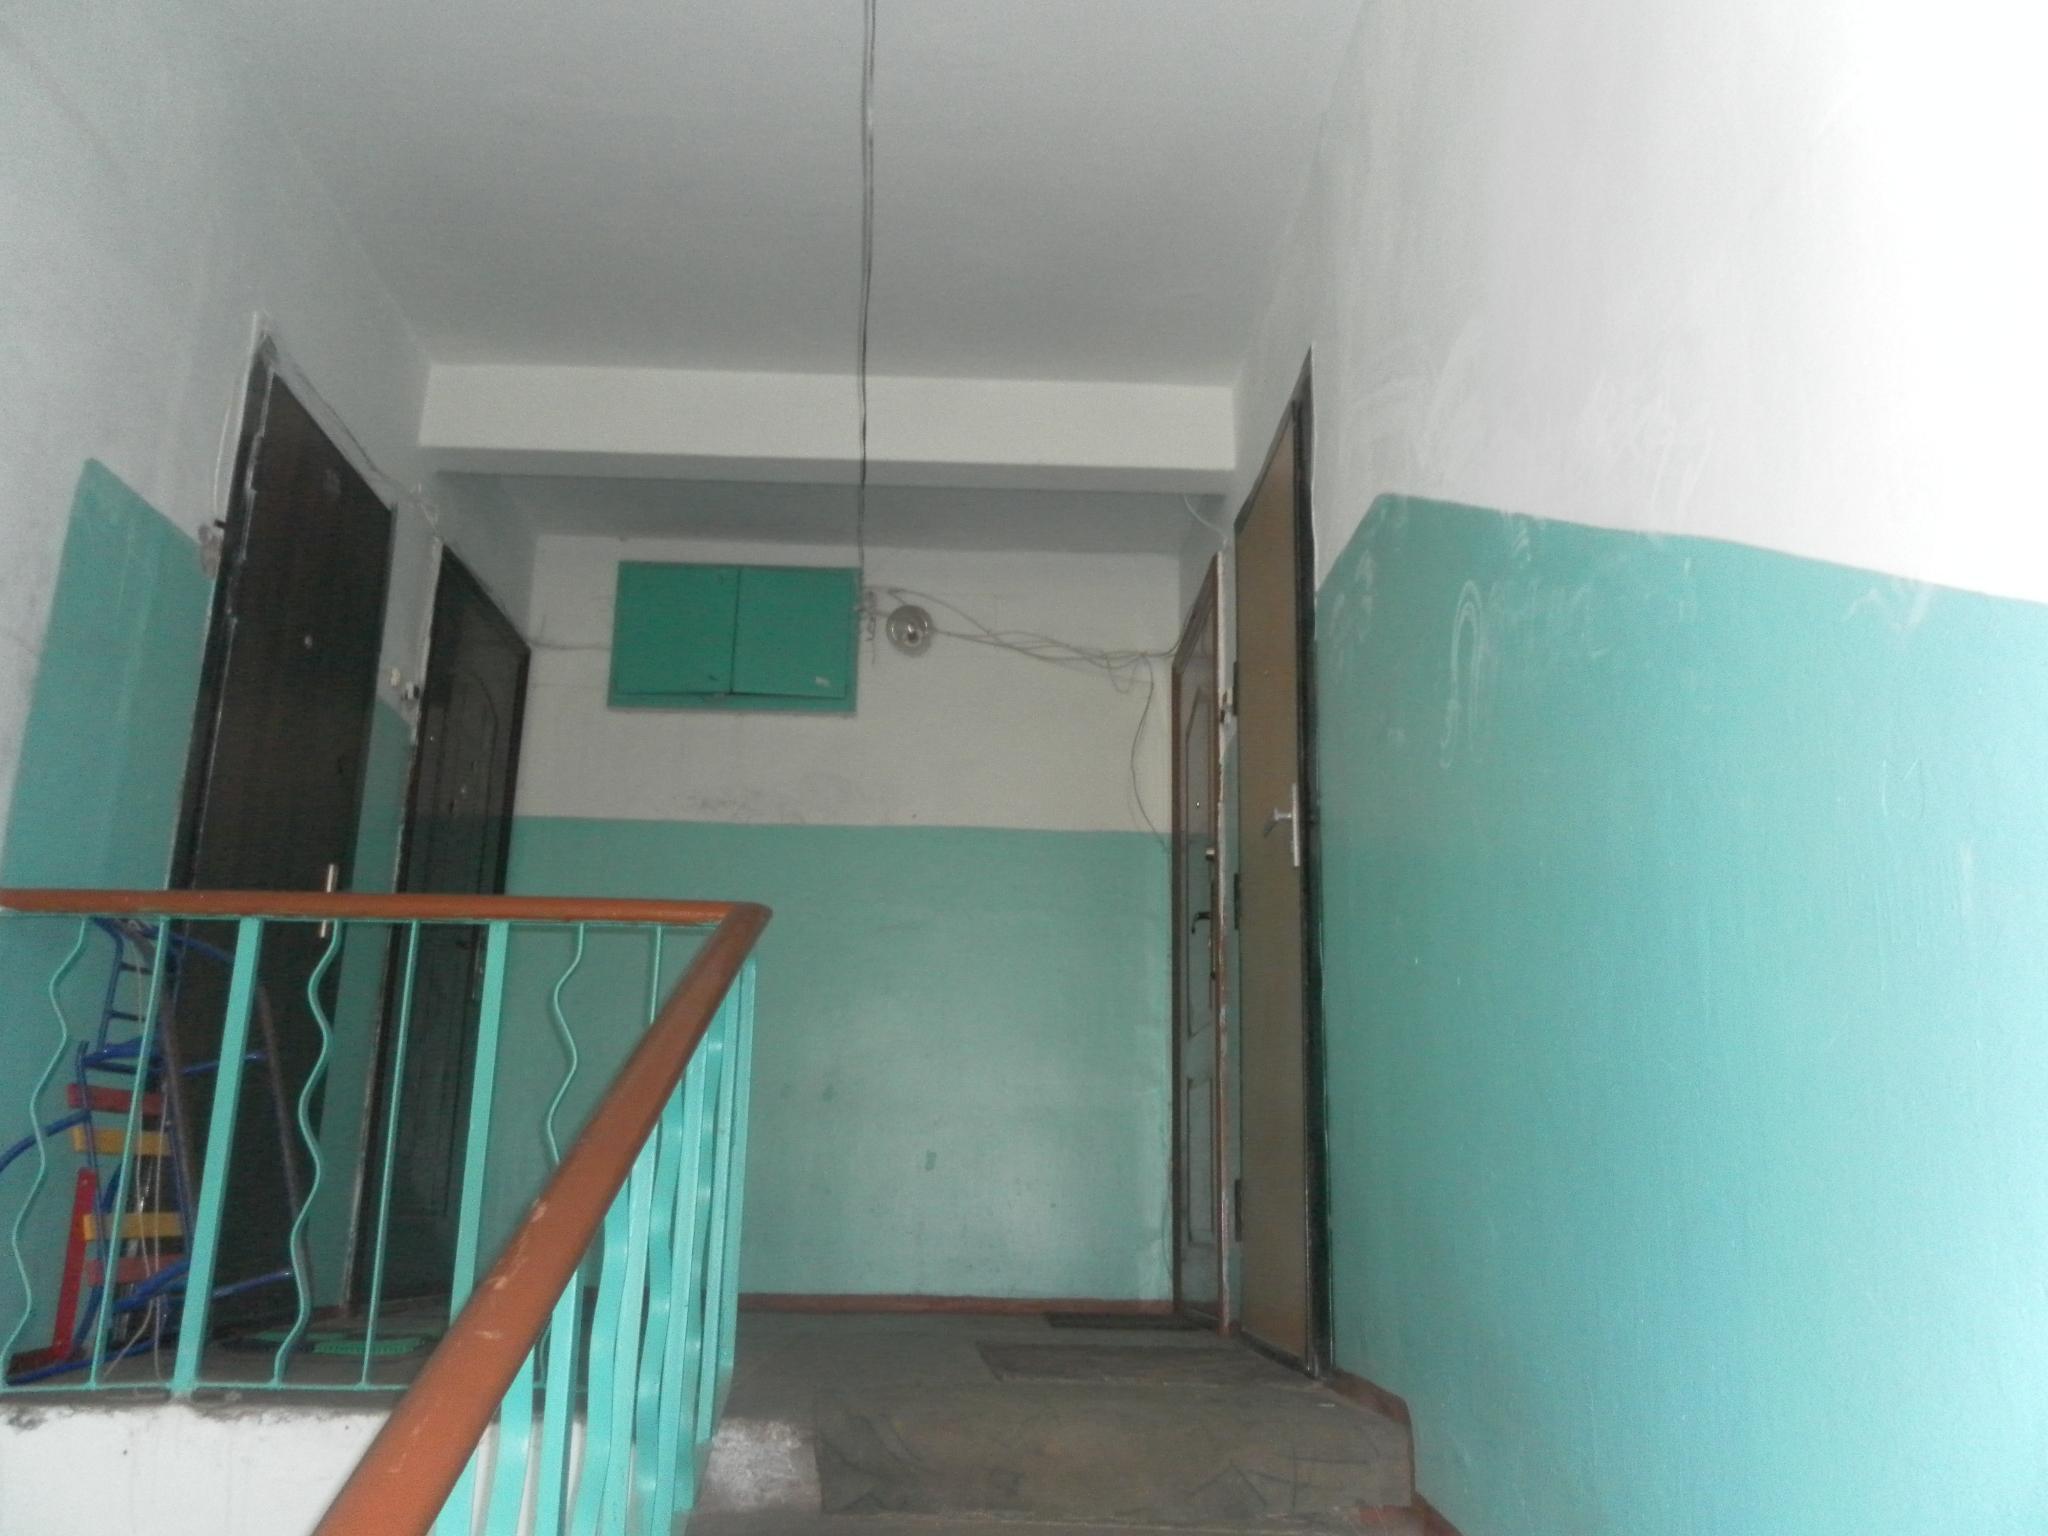 Трехкомнатная квартира - ул. 23 Июля, д. 5